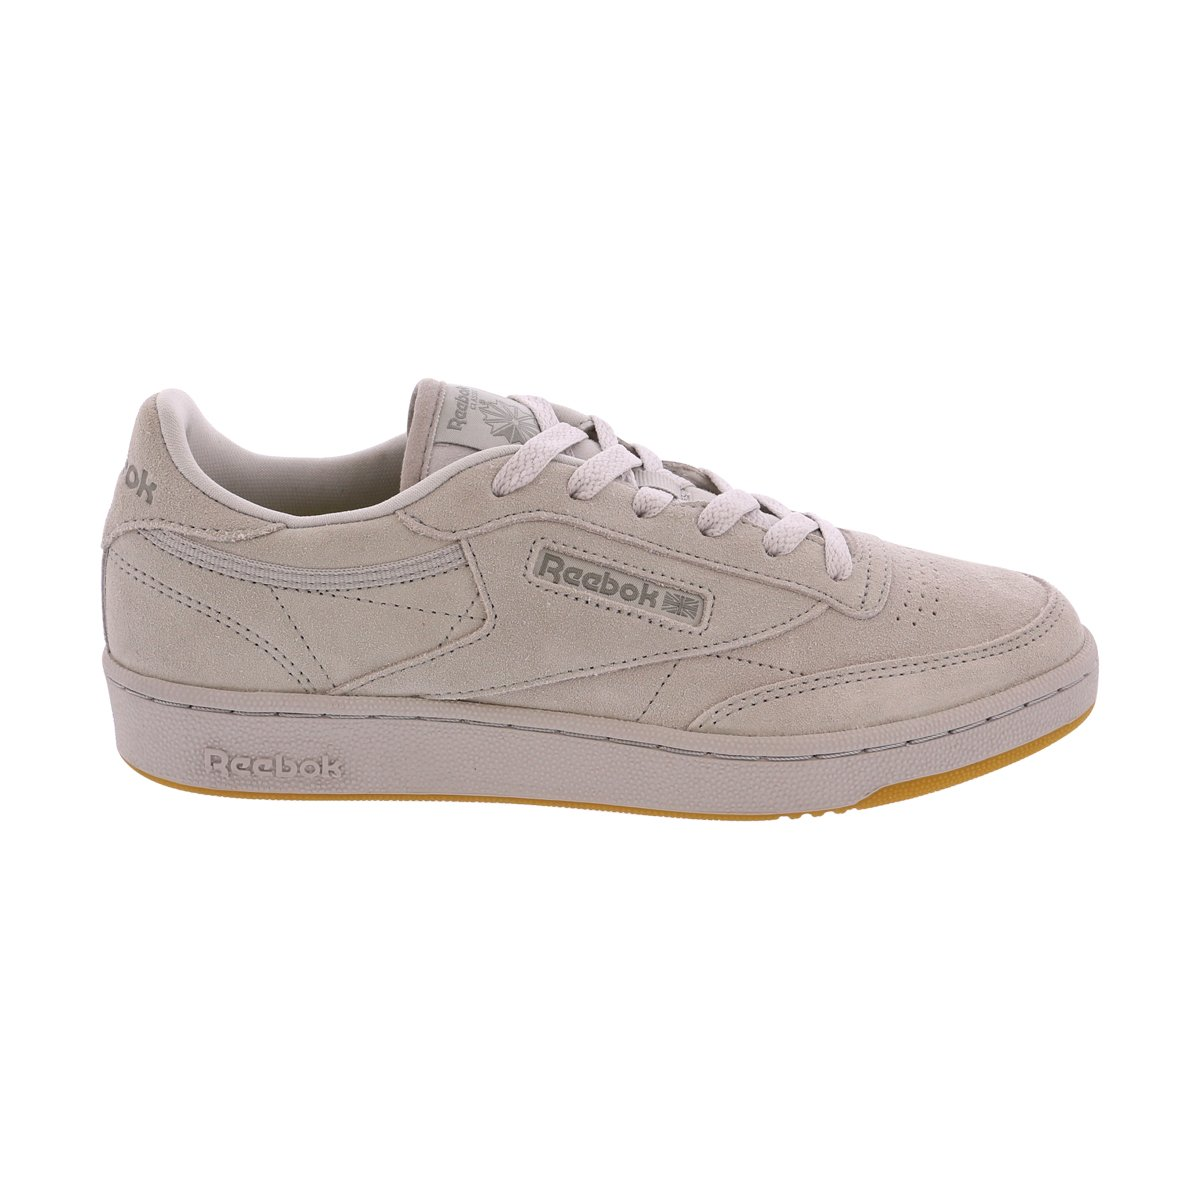 Reebok Kids Unisex Club C 85 TG (Big Kid) Steel/Carbon/Gum Athletic Shoe